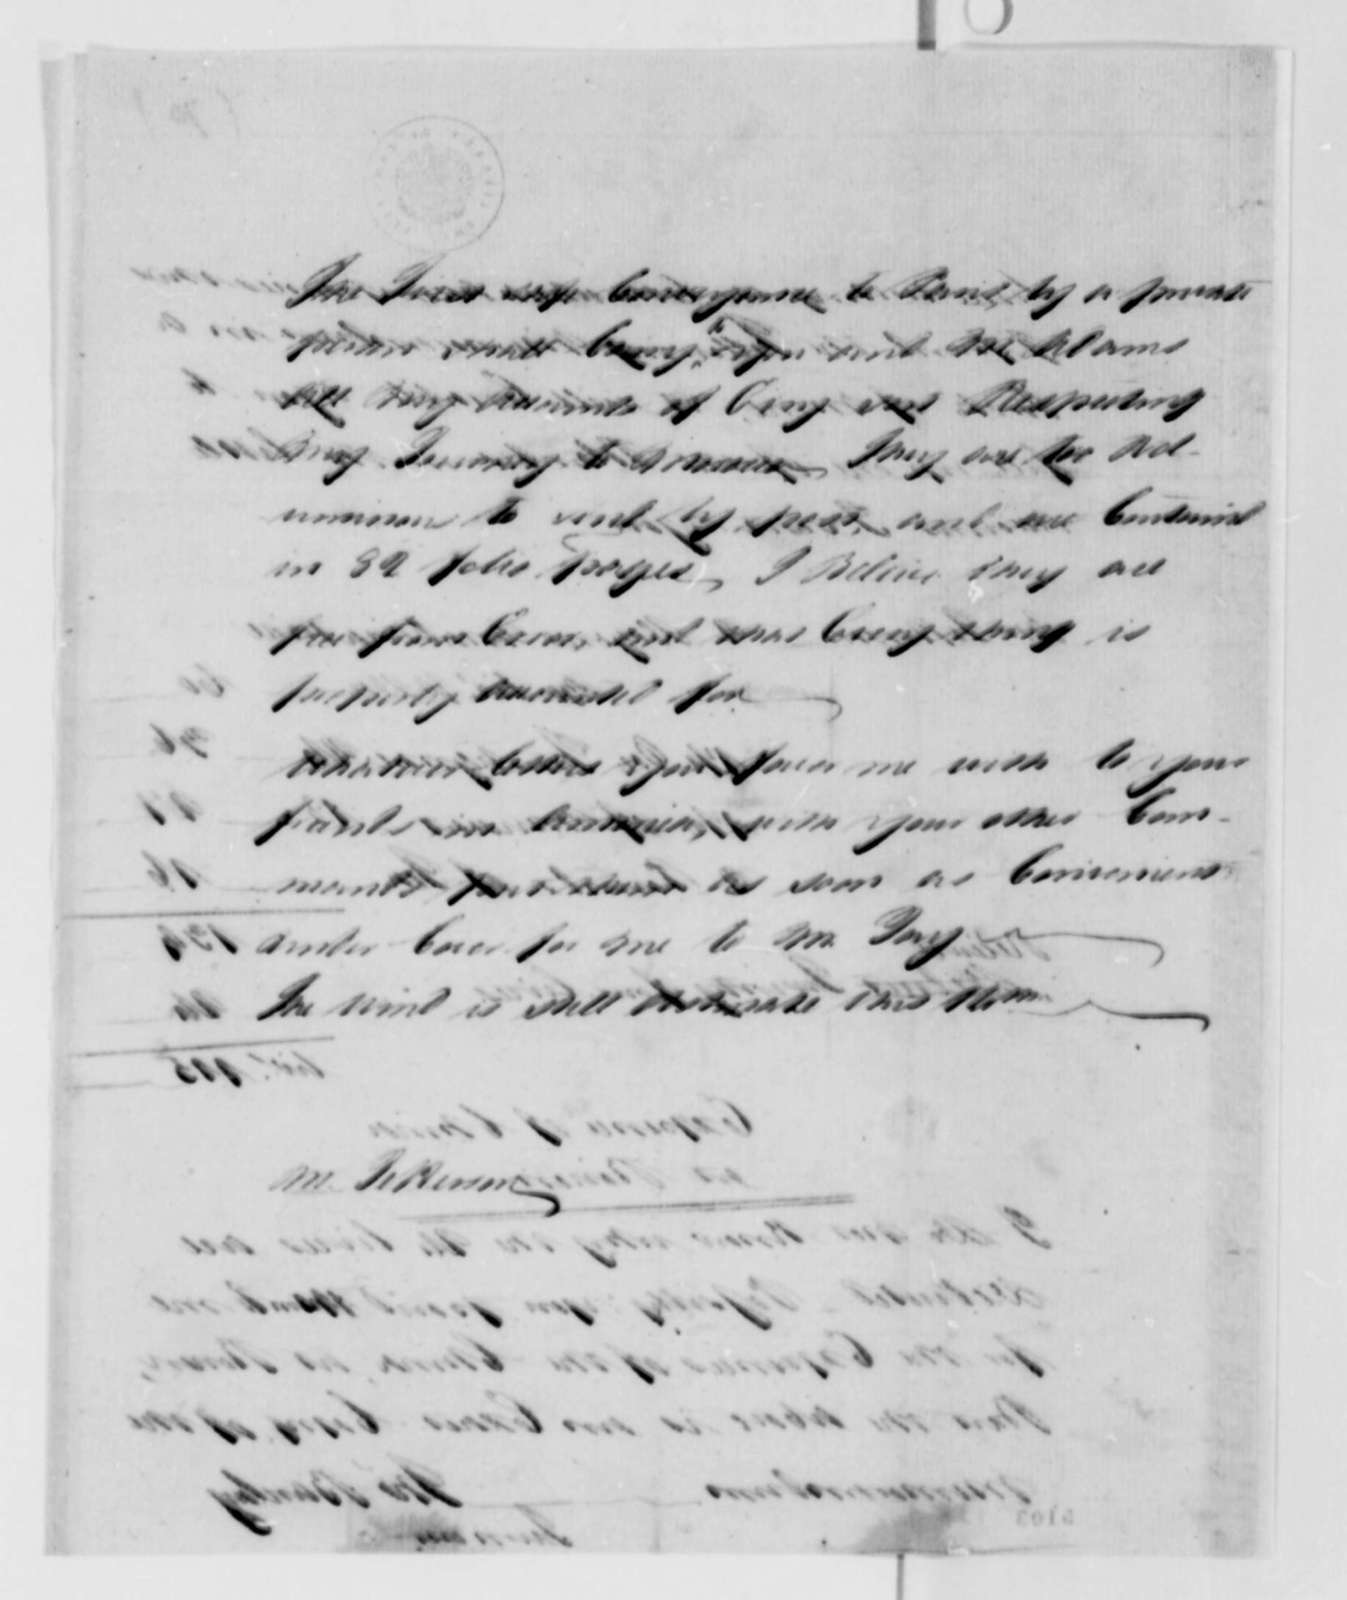 Thomas Barclay to Thomas Jefferson, June 12, 1787